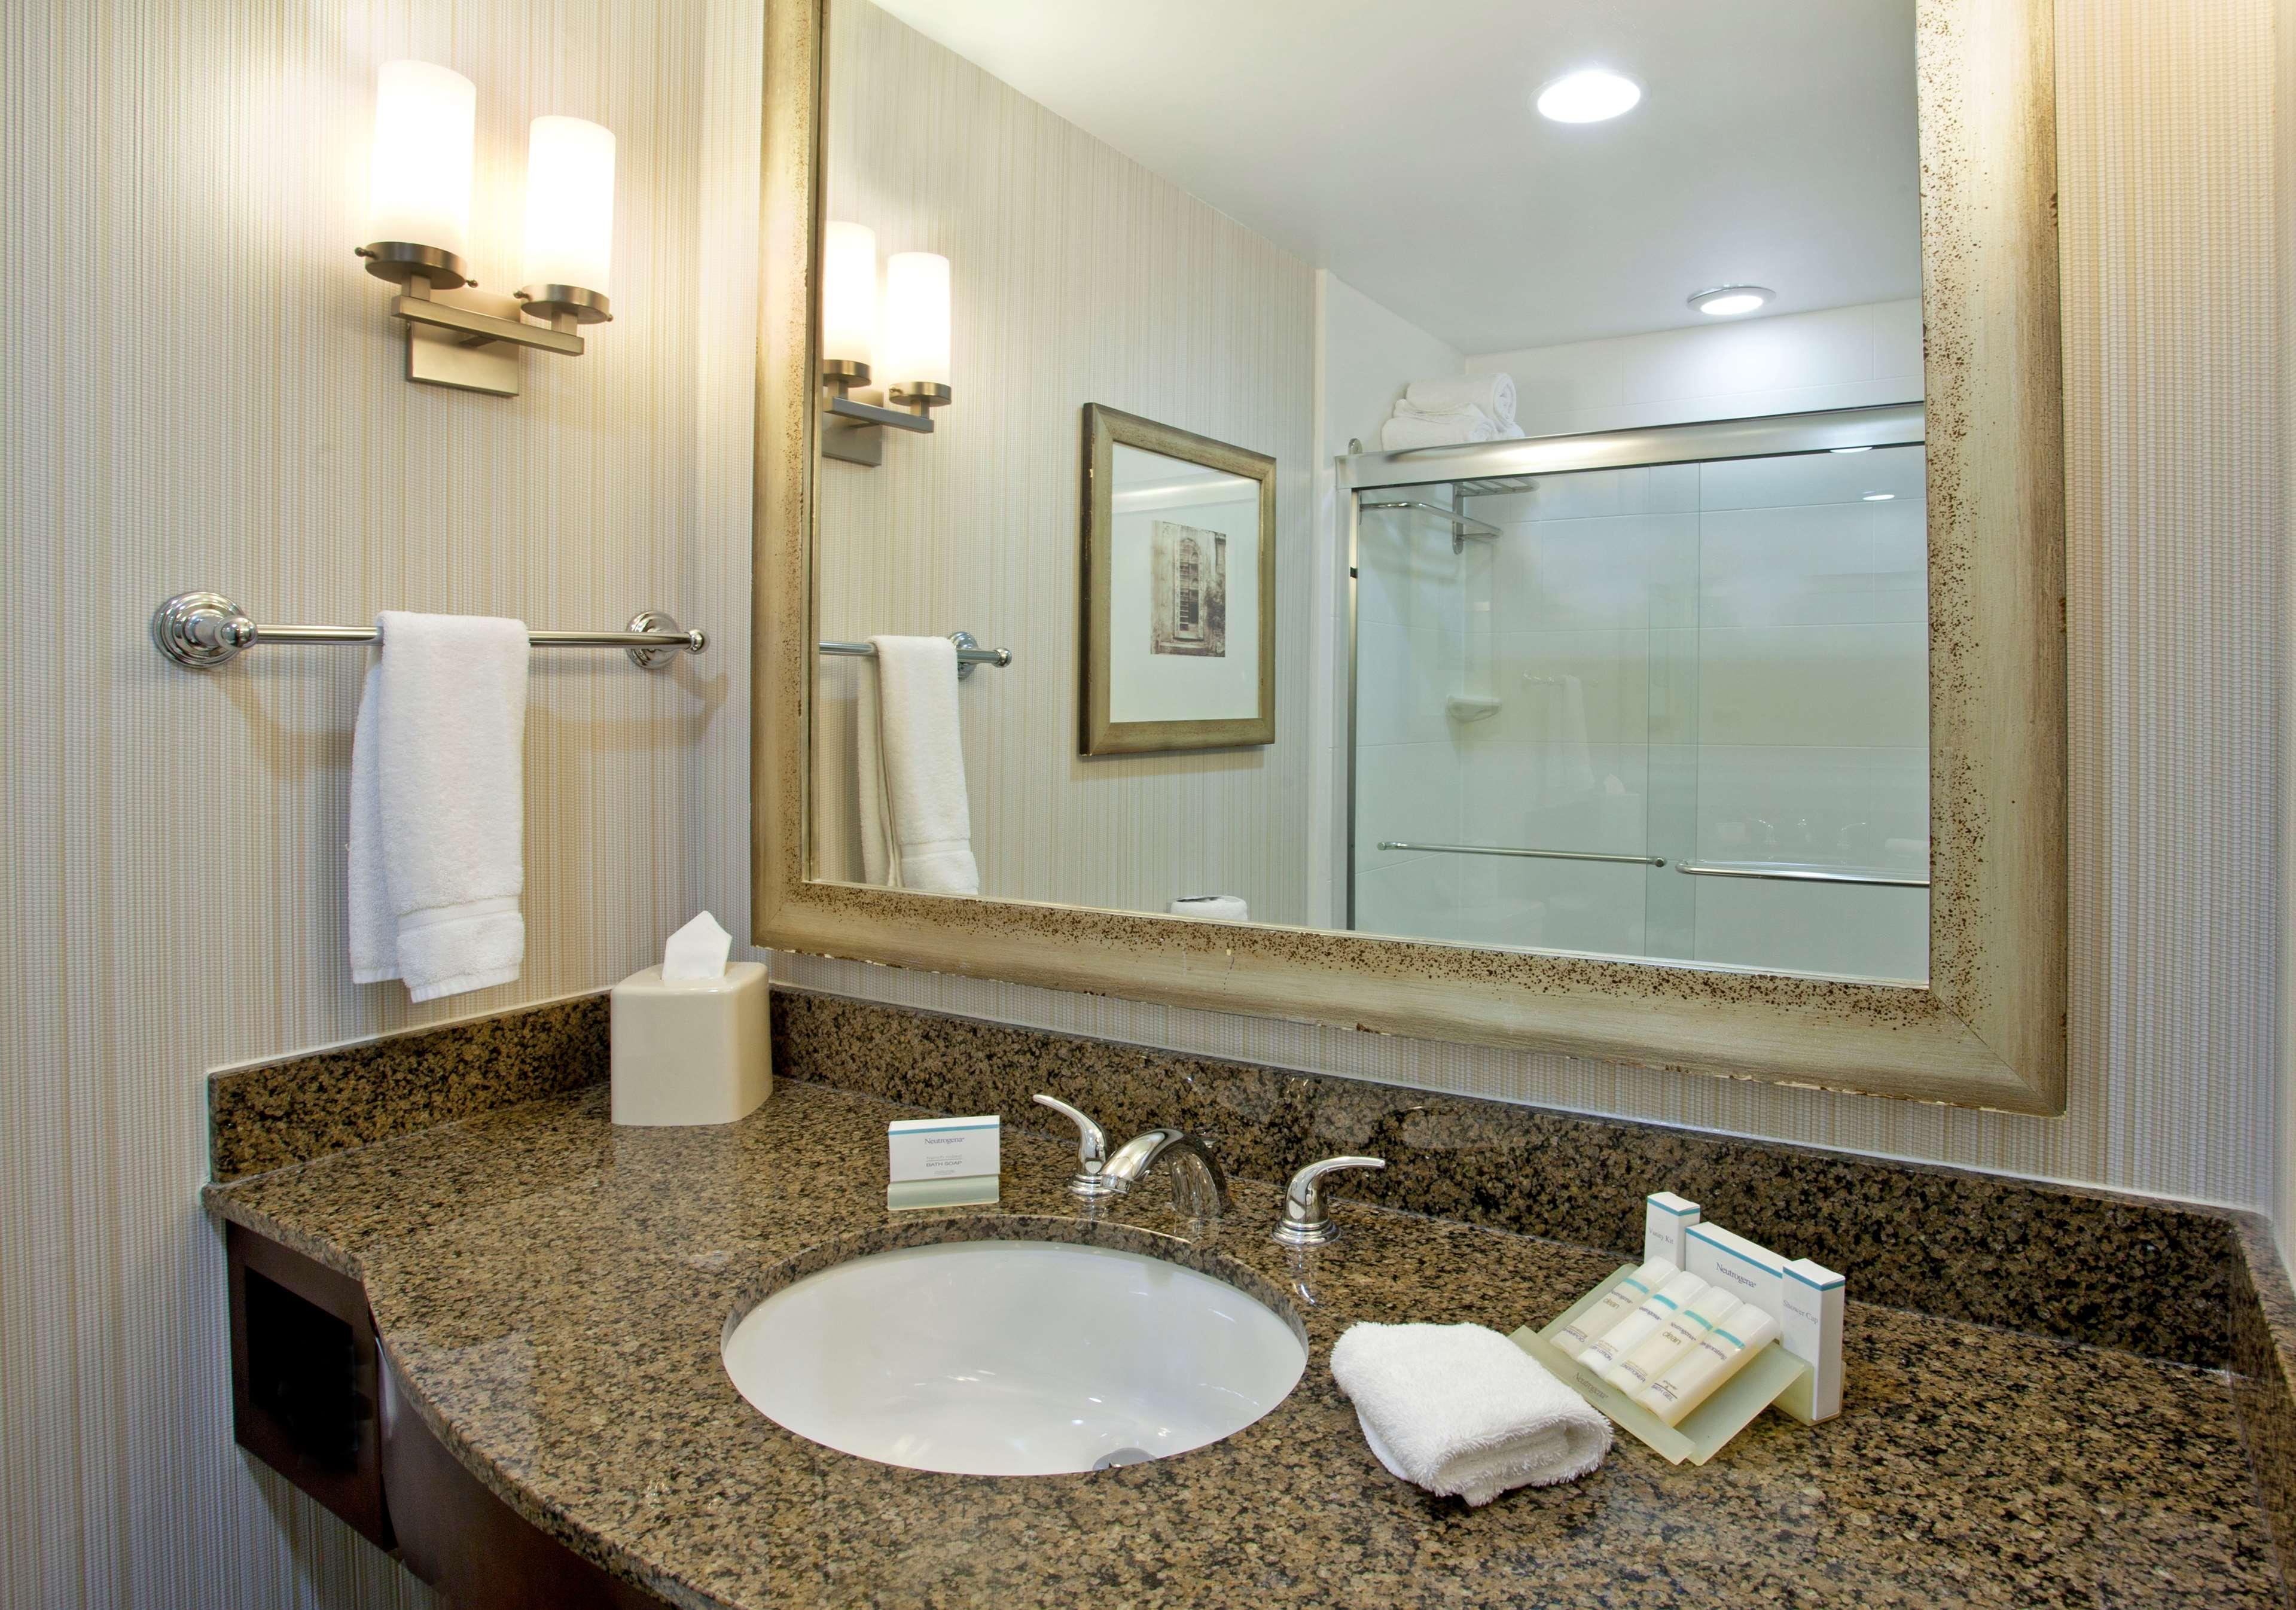 Hilton Garden Inn Winston-Salem/Hanes Mall image 14